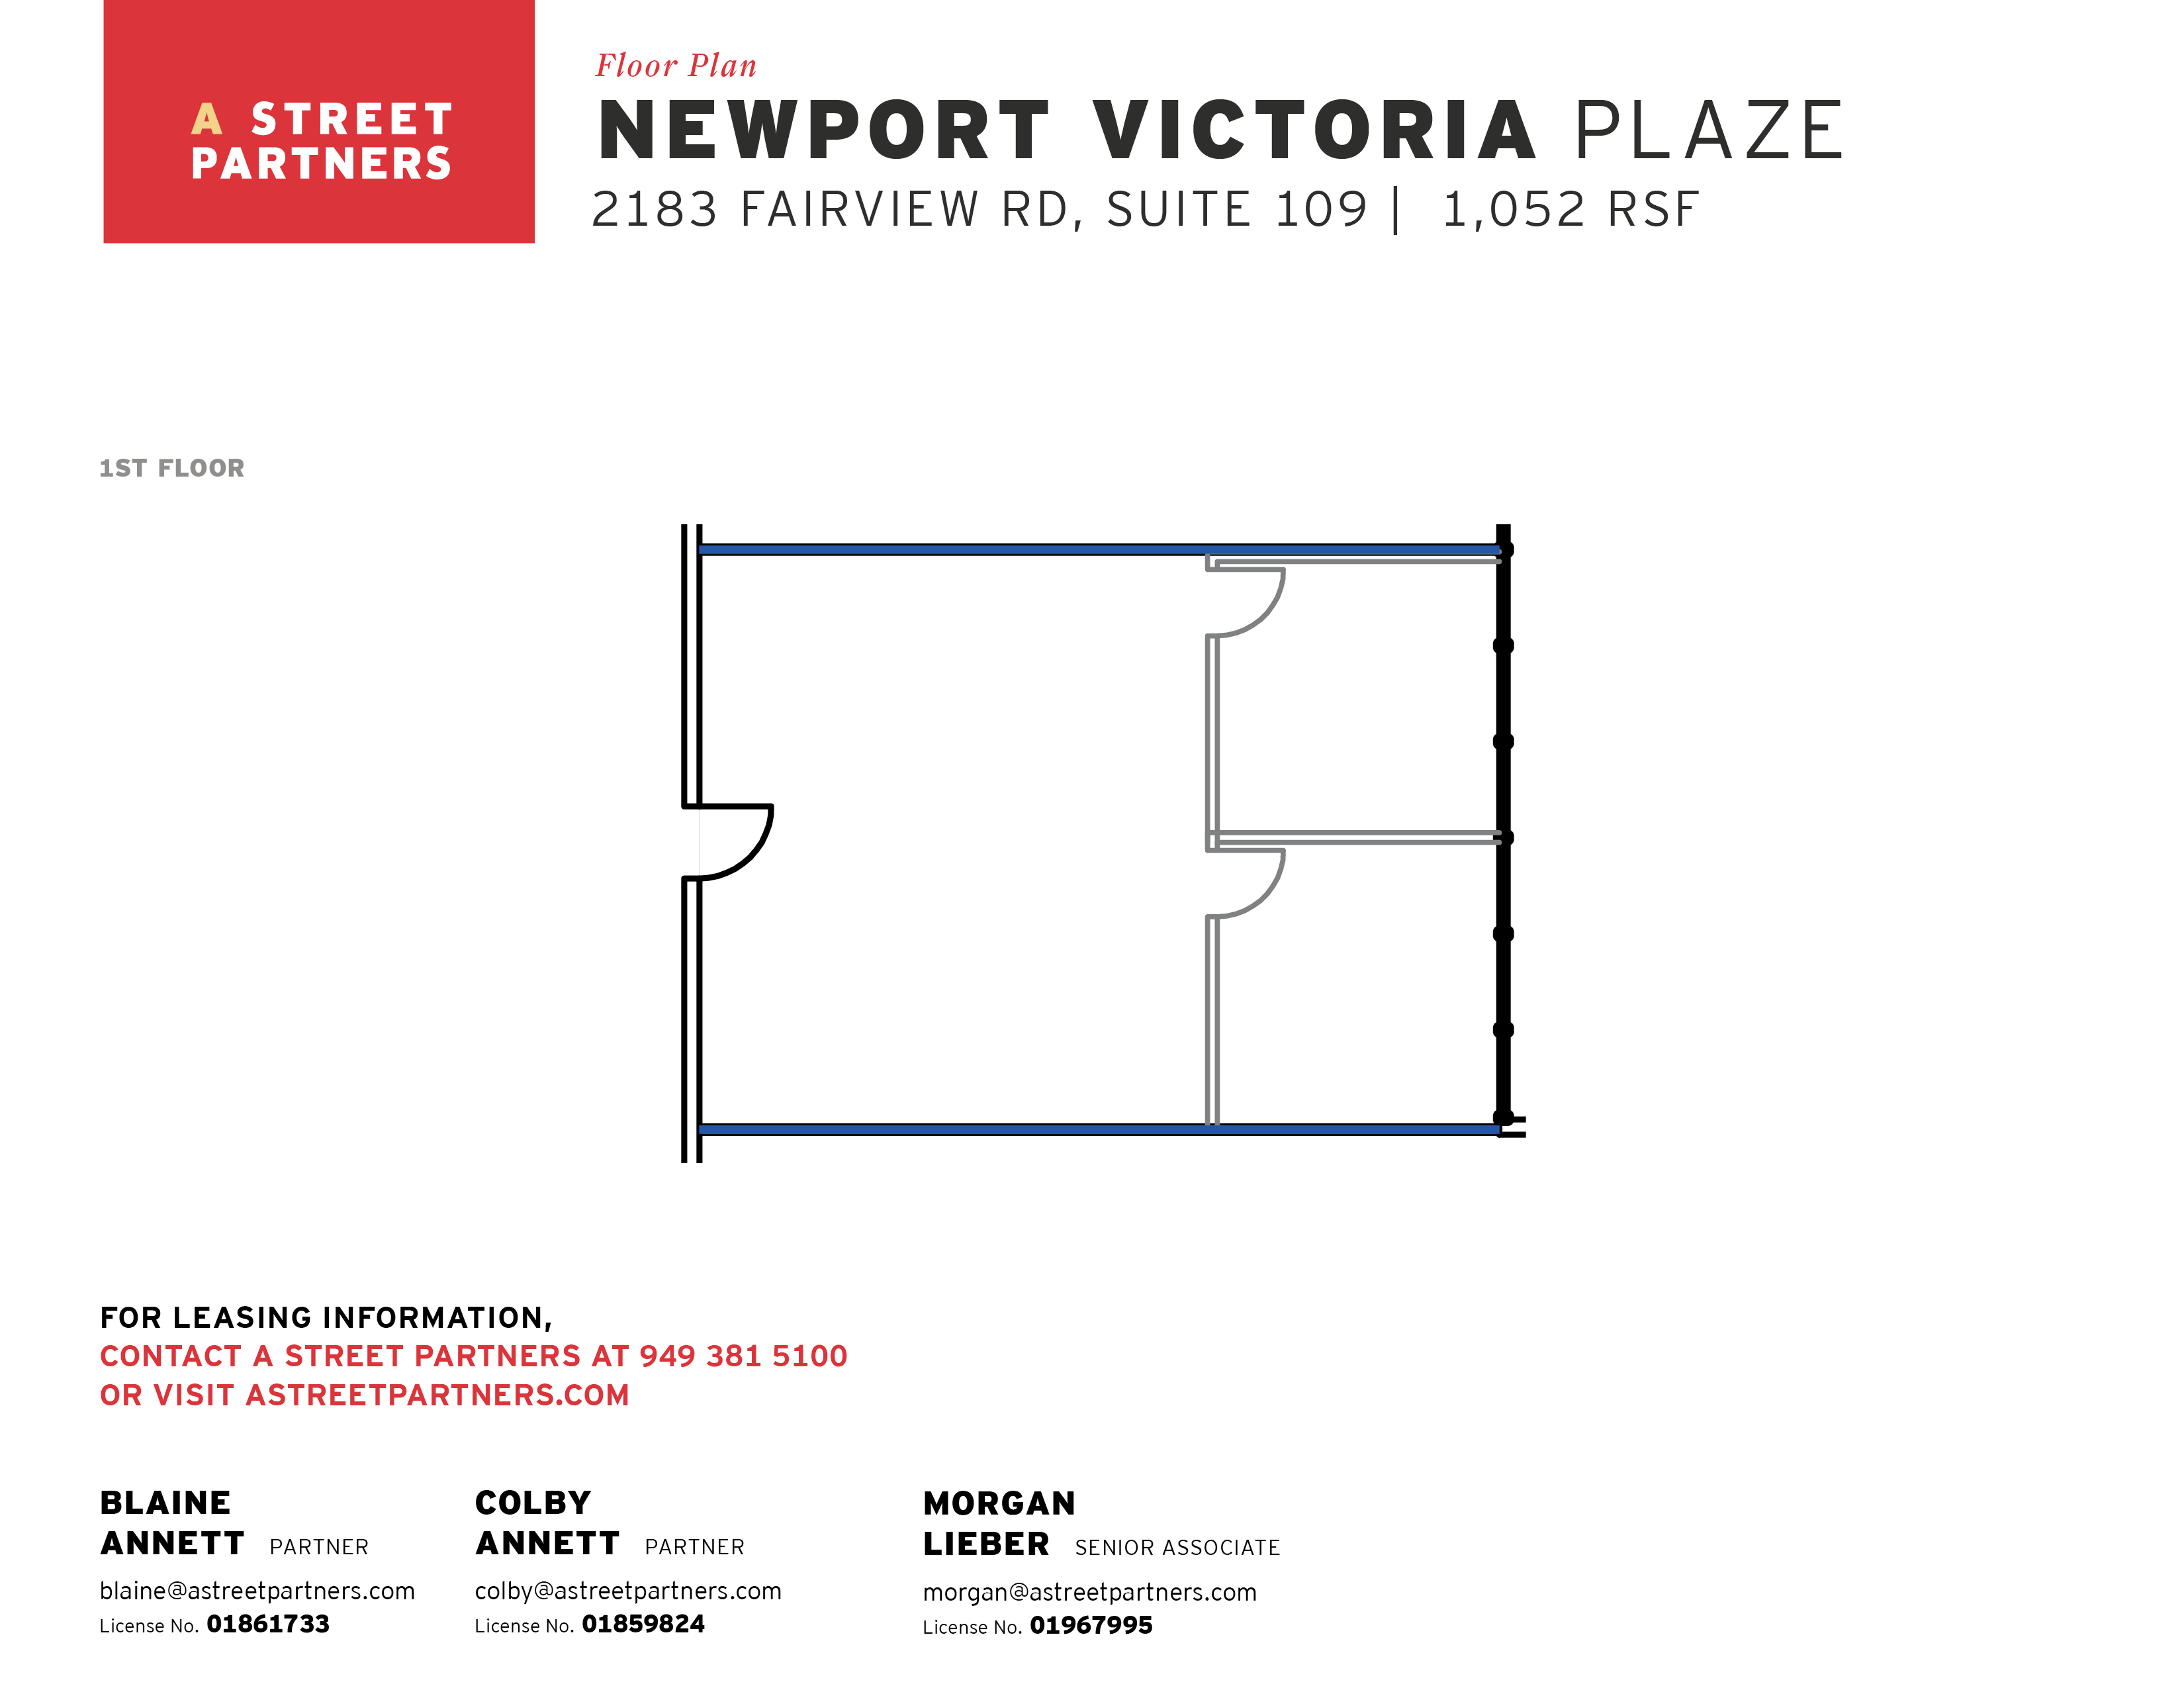 Newport Victoria Plaza